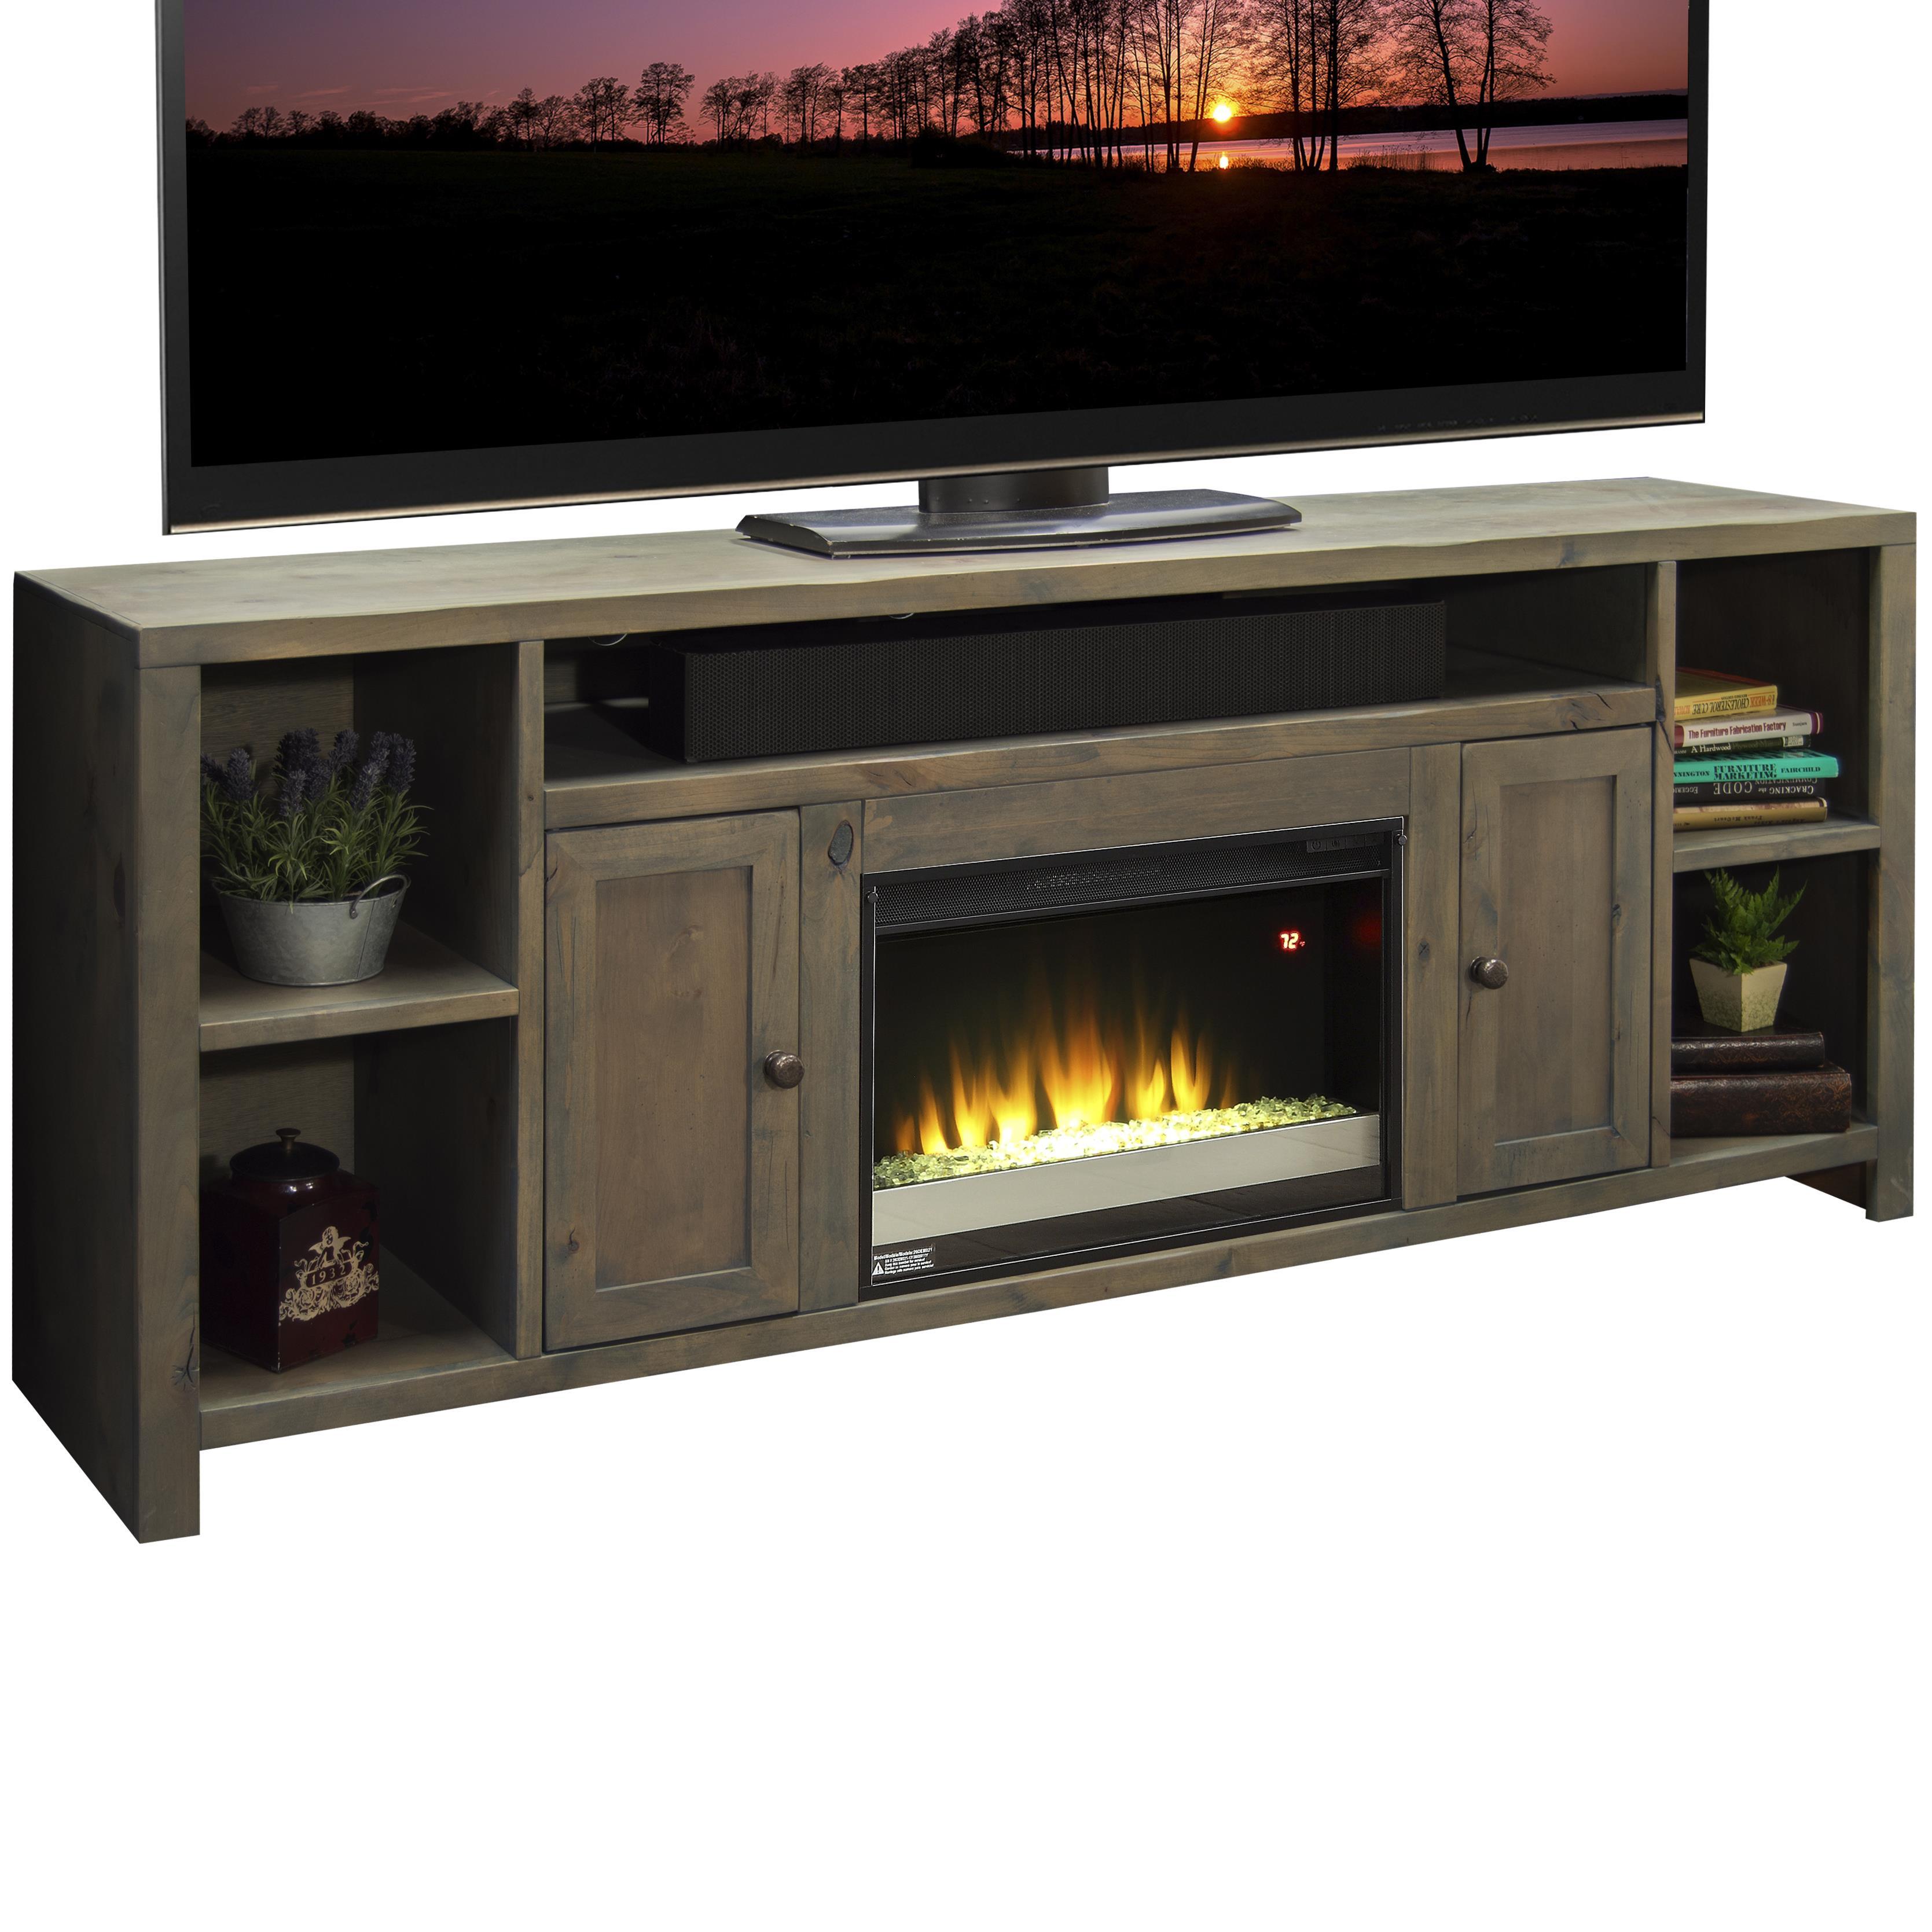 "Legends Furniture Joshua Creek 85"" Super Fireplace - Item Number: JC5284-KIT"